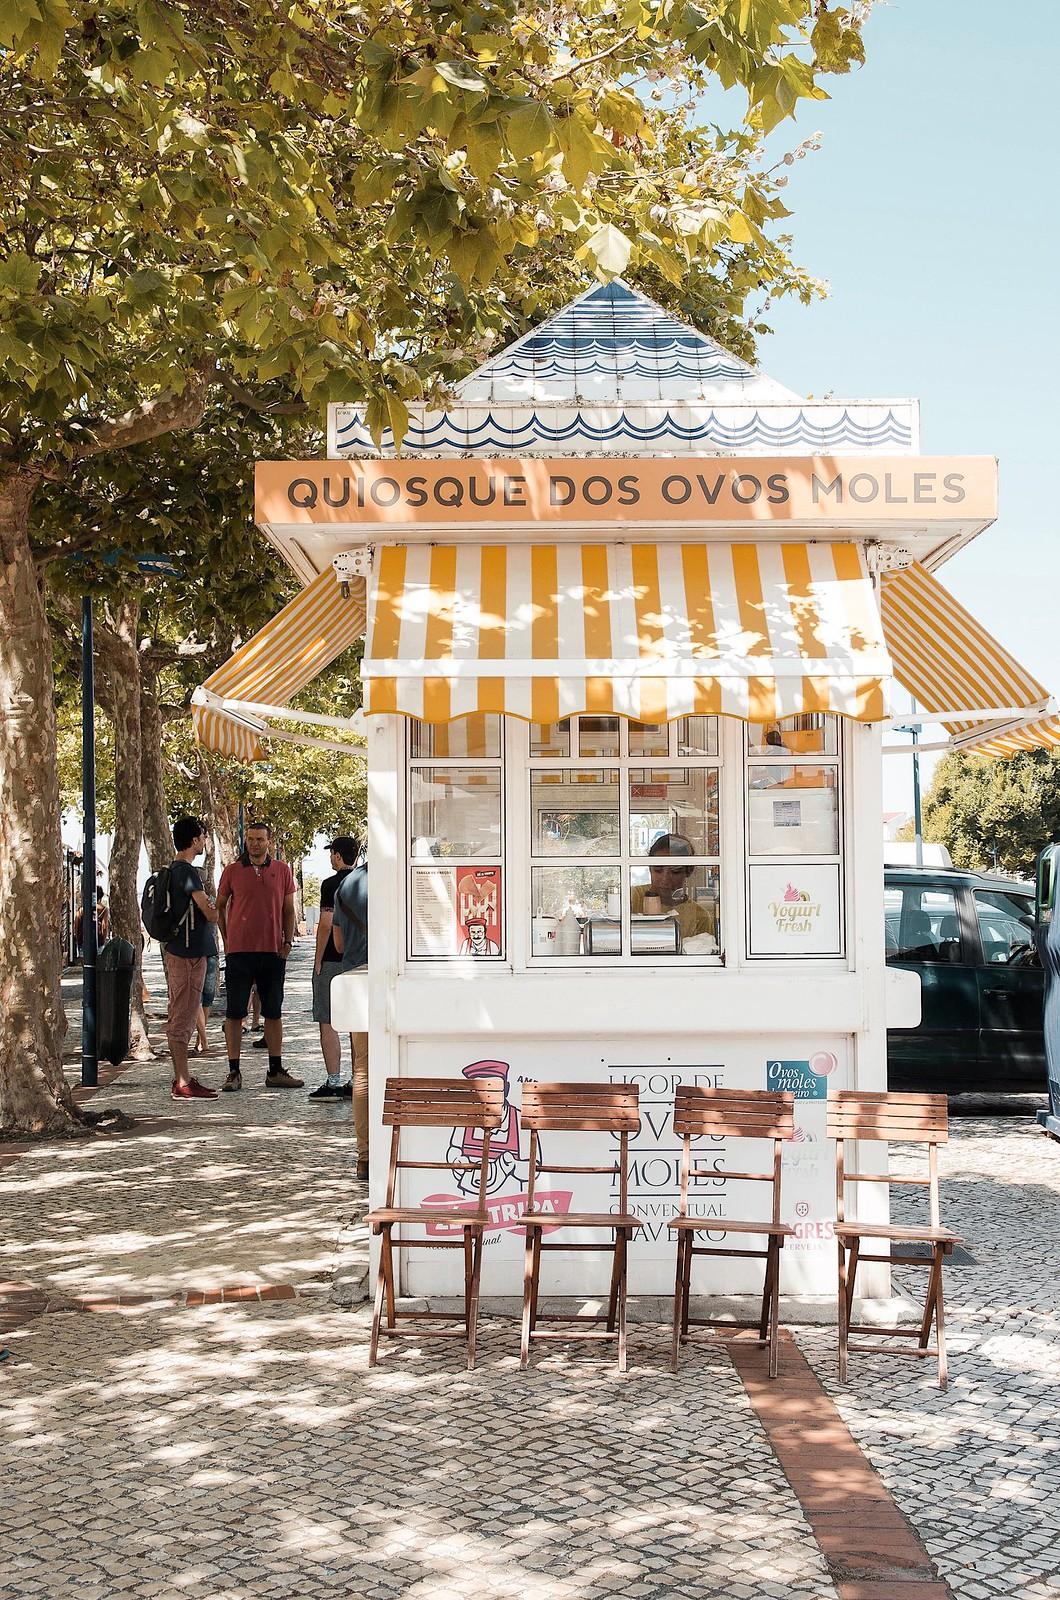 Qué comer en Aveiro. Foto ©mvesblog